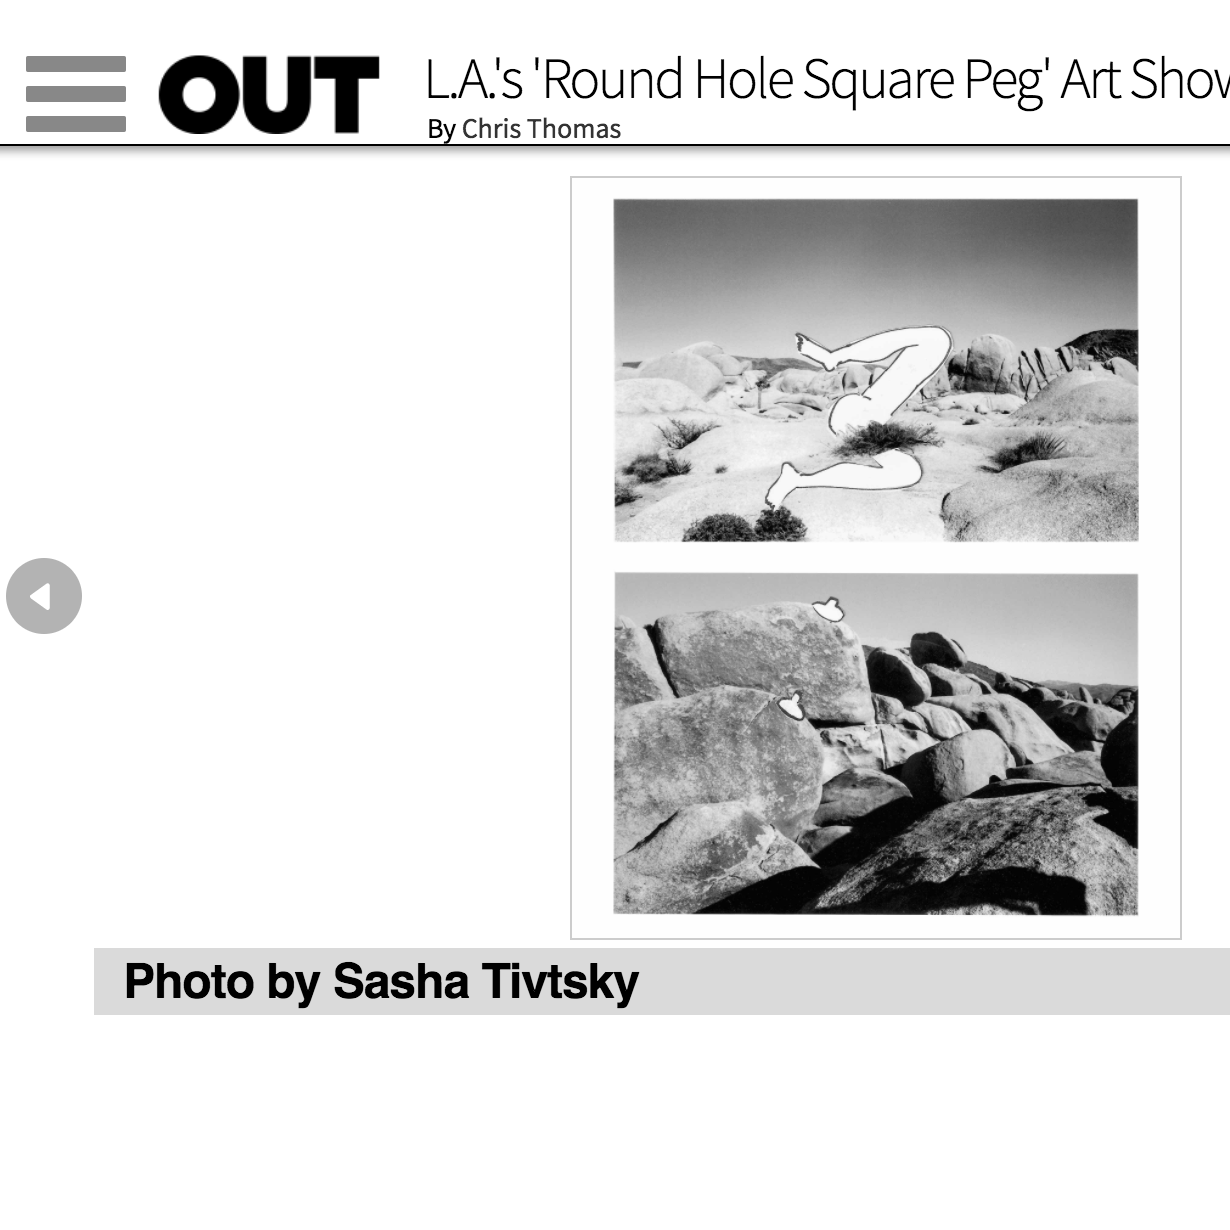 OUT Magazine Press